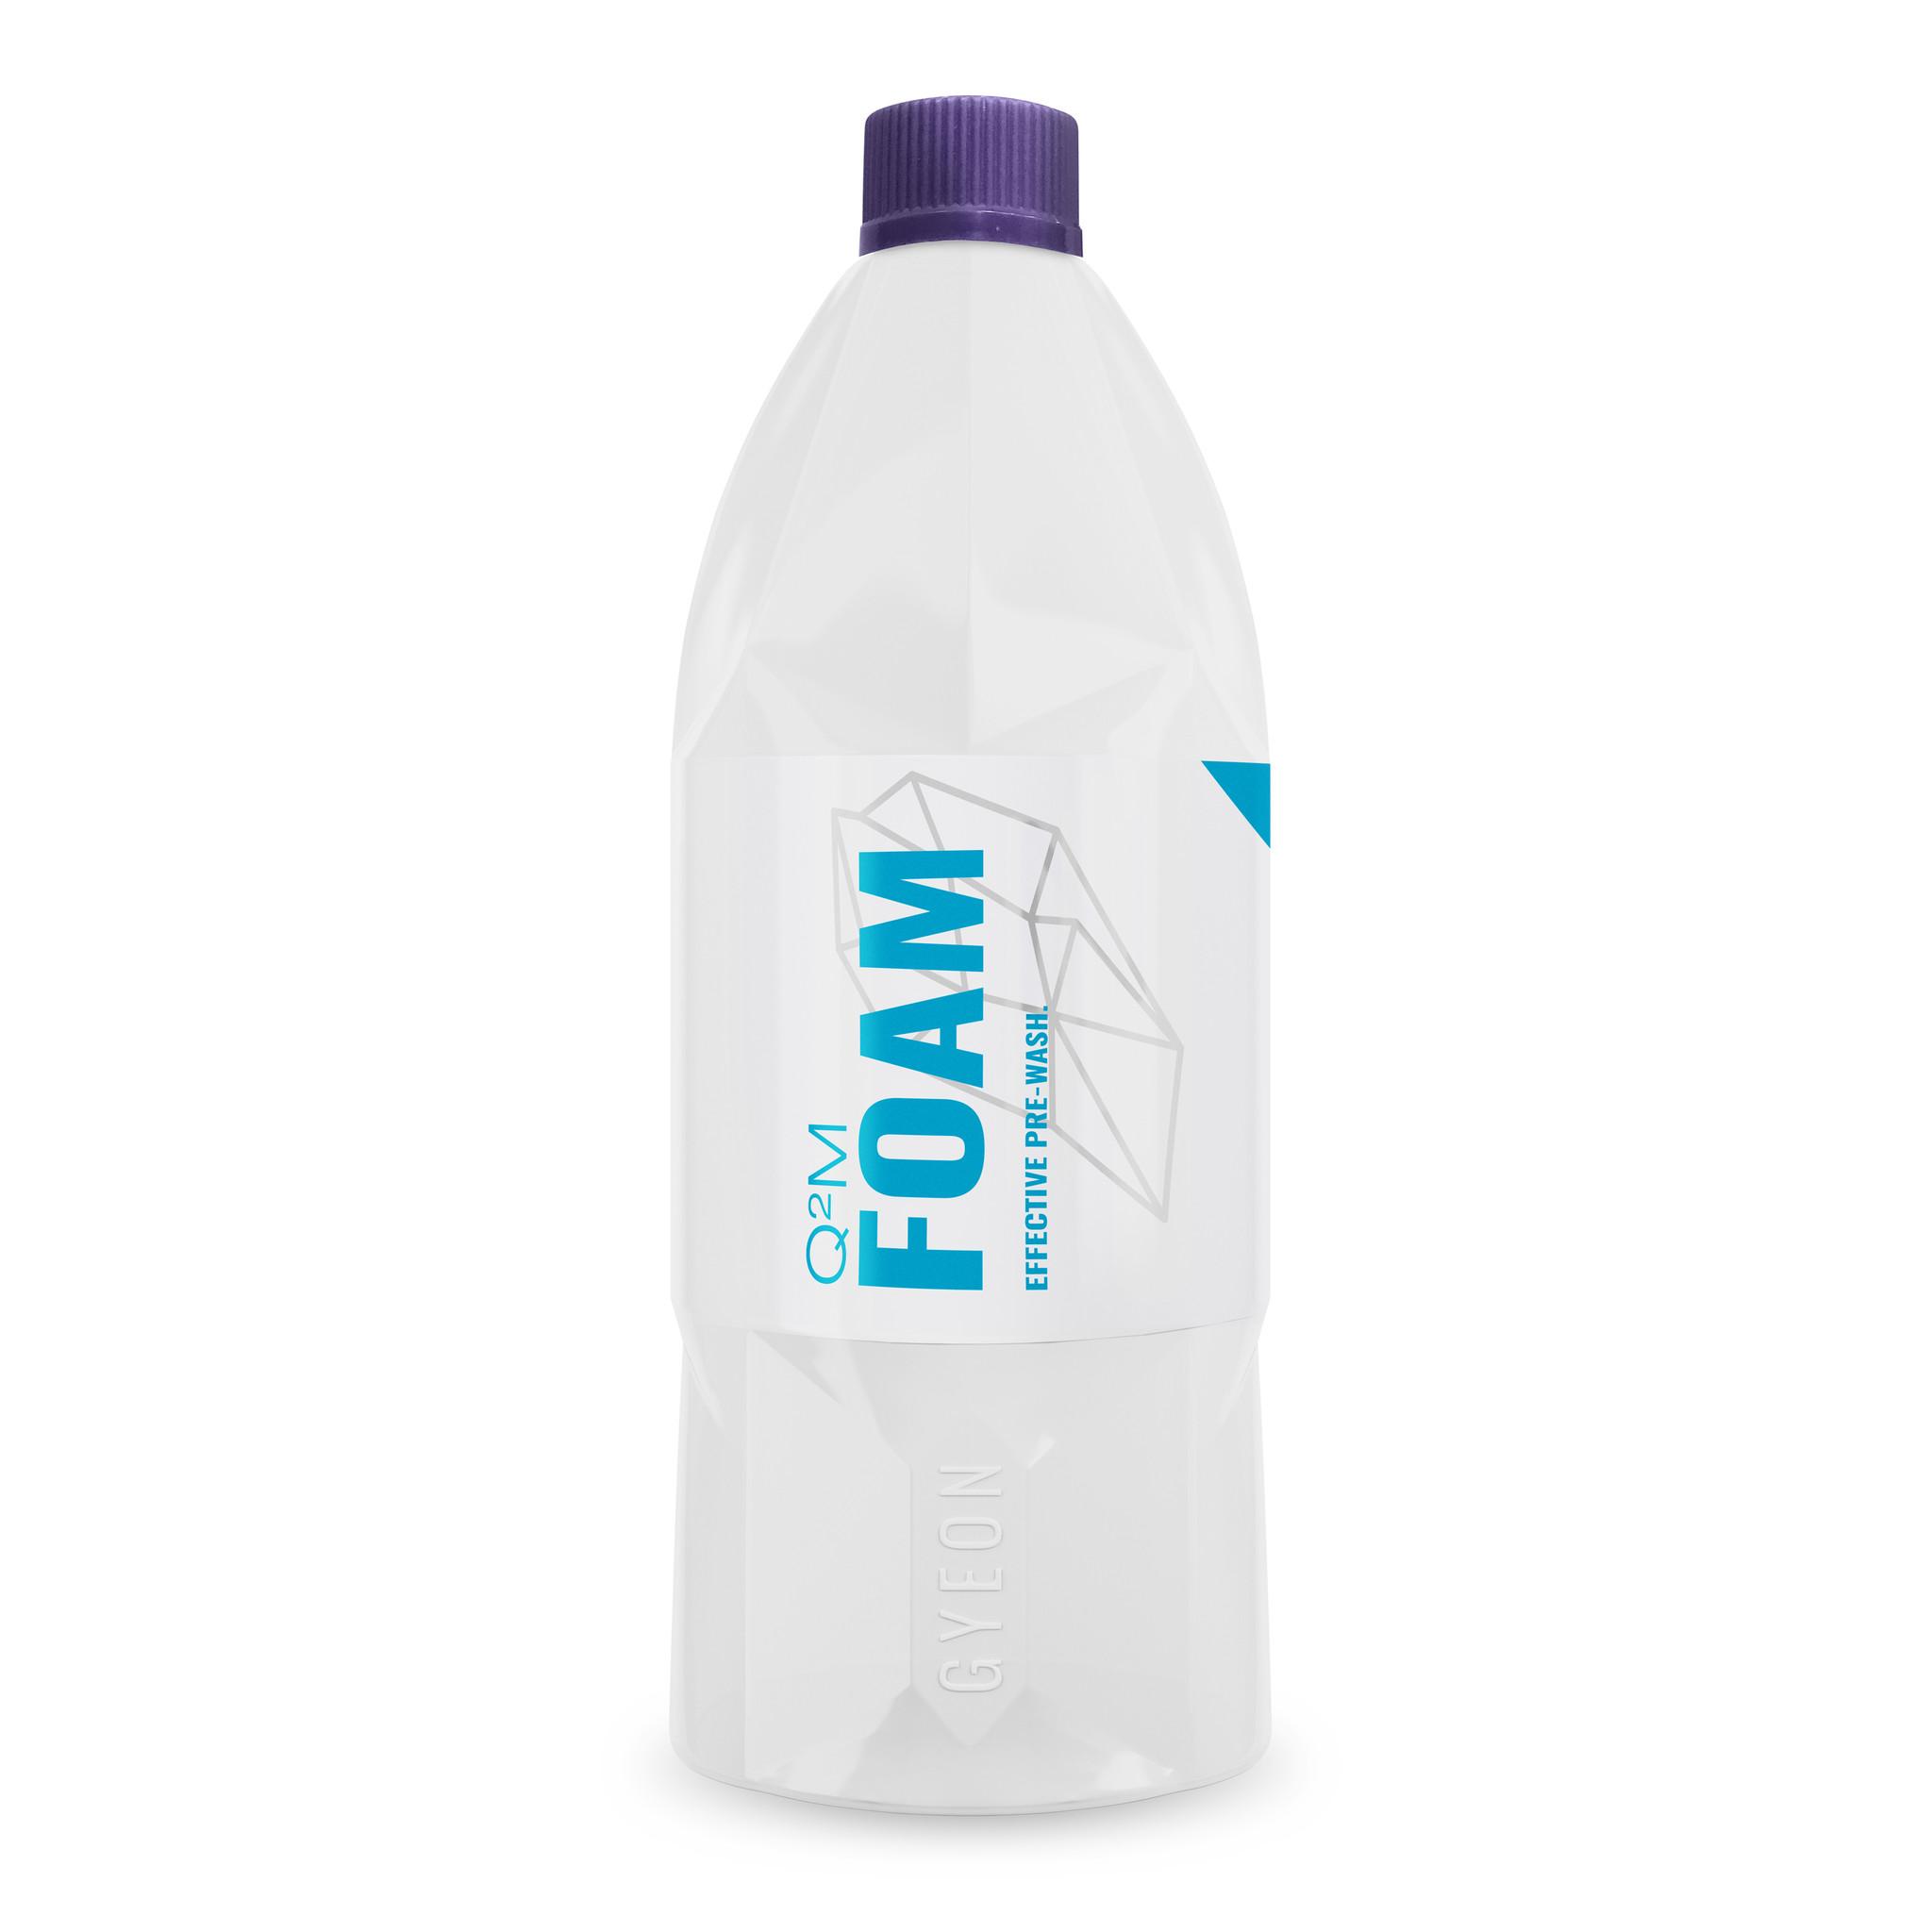 Gyeon Q2M Foam